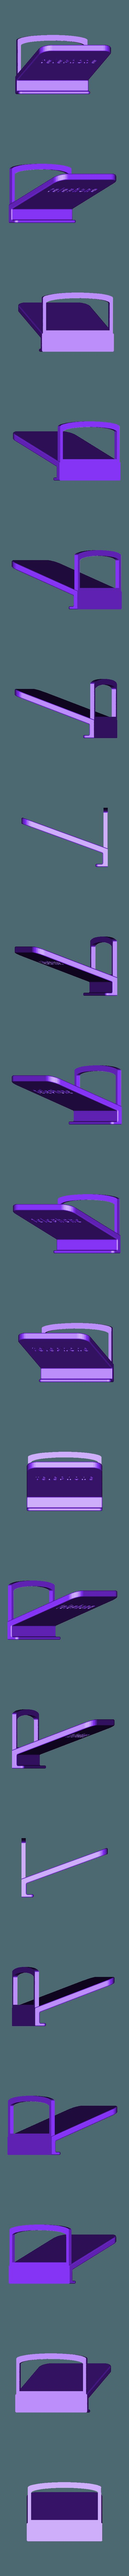 supp_chargeur3.1.stl Download free STL file support de téléphone • 3D printing template, Cyborg